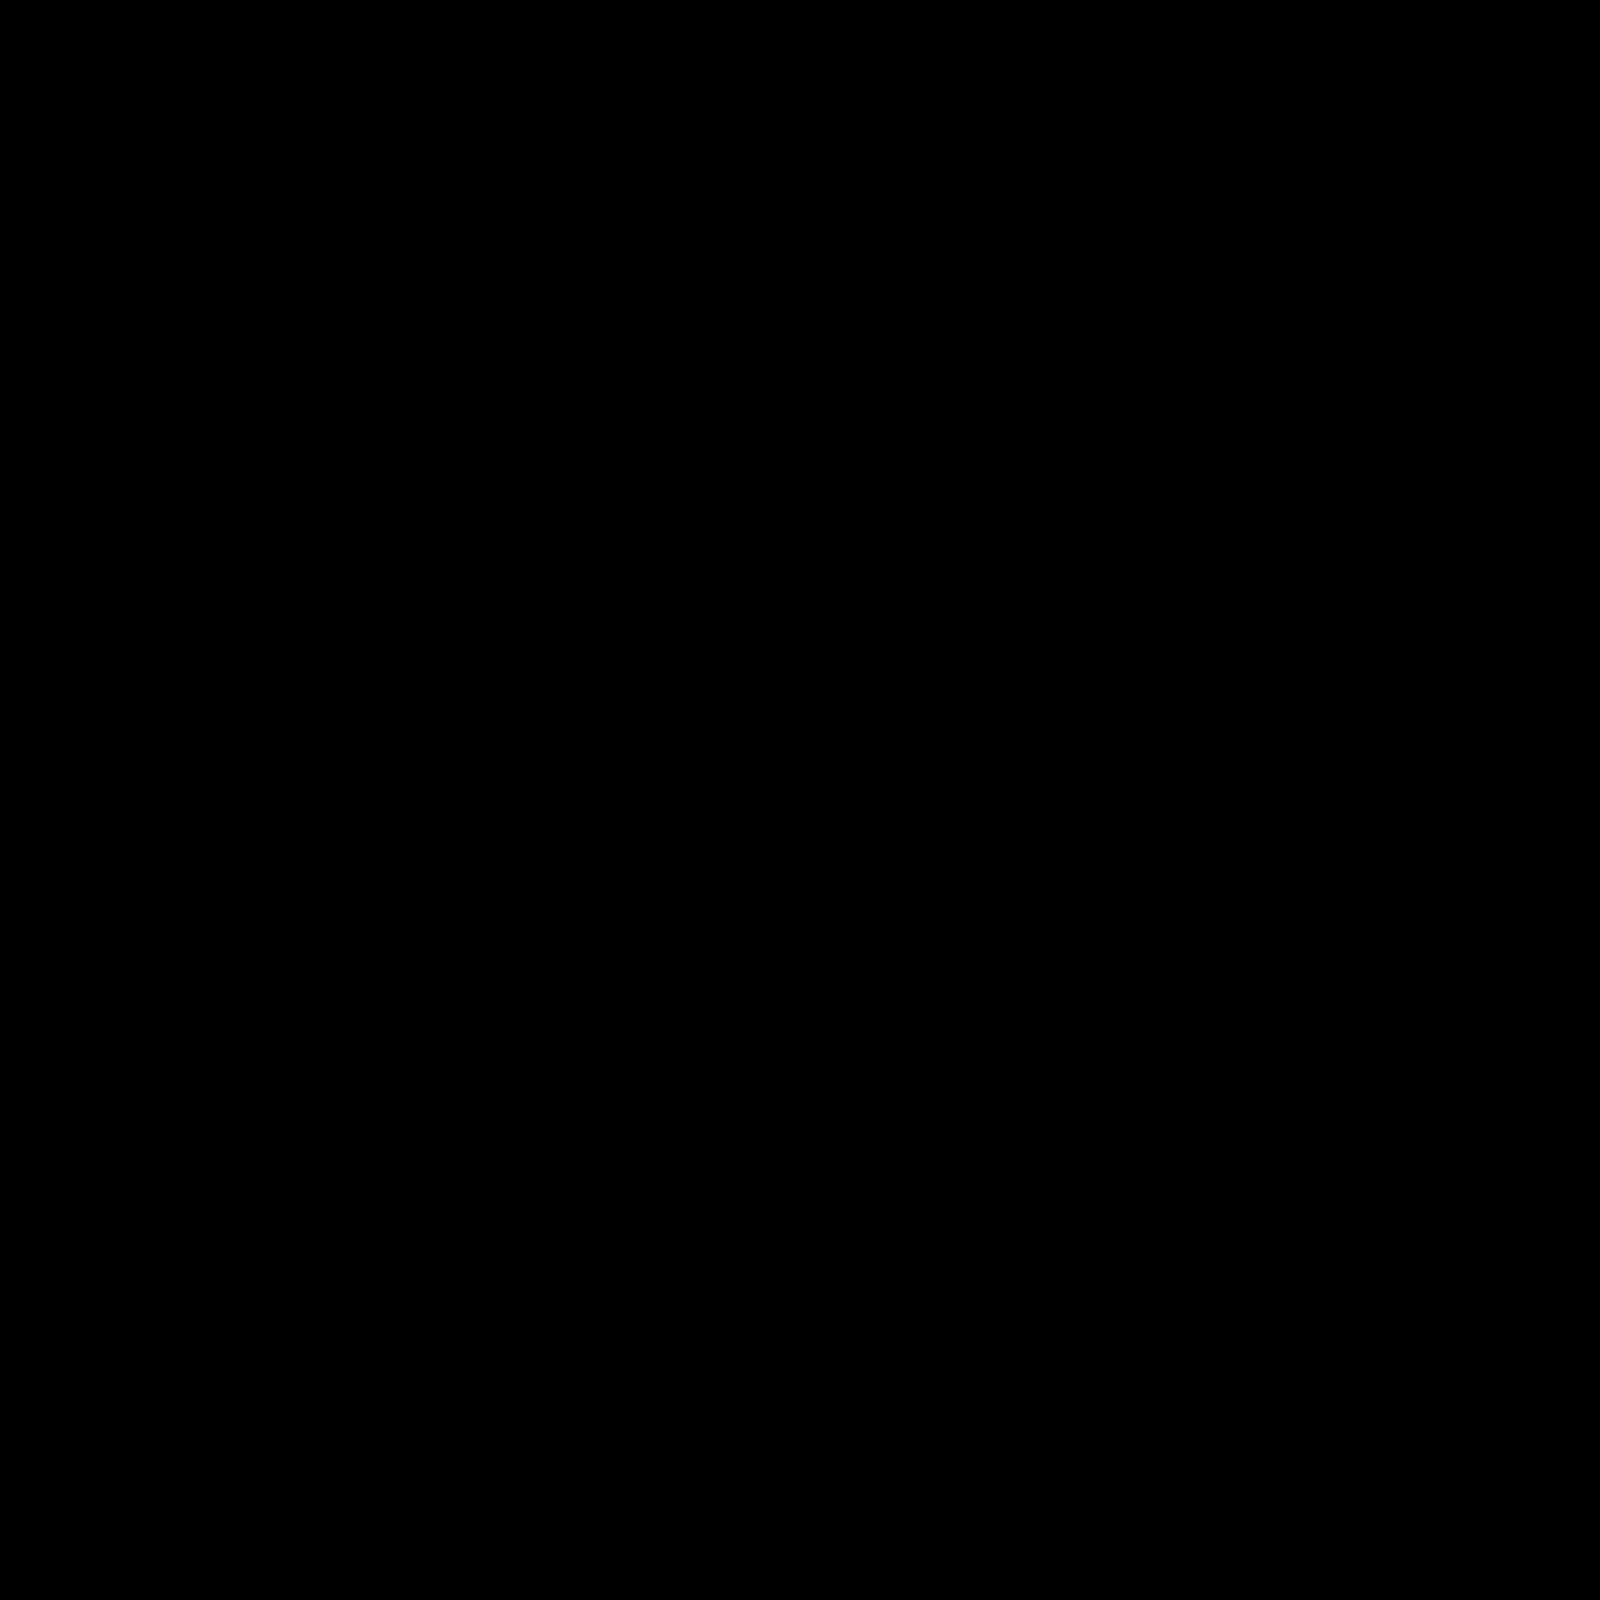 Portmonetka icon